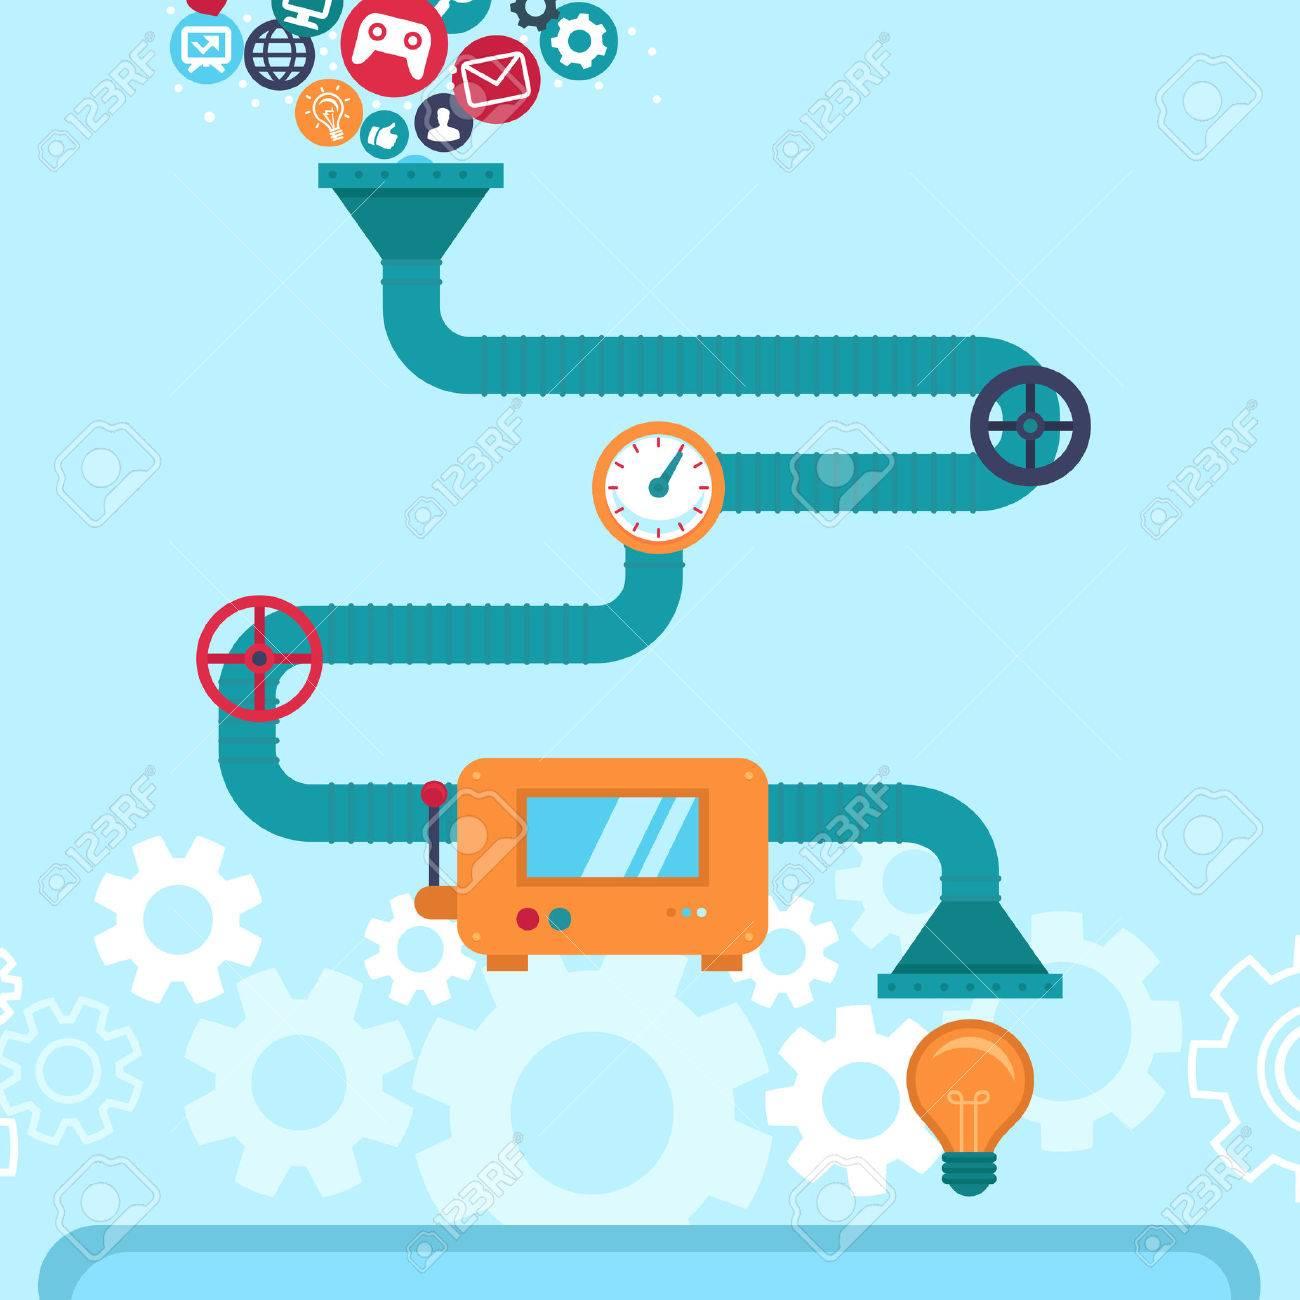 Vector abstract infographics in flat style -creative idea generatir - 33354881